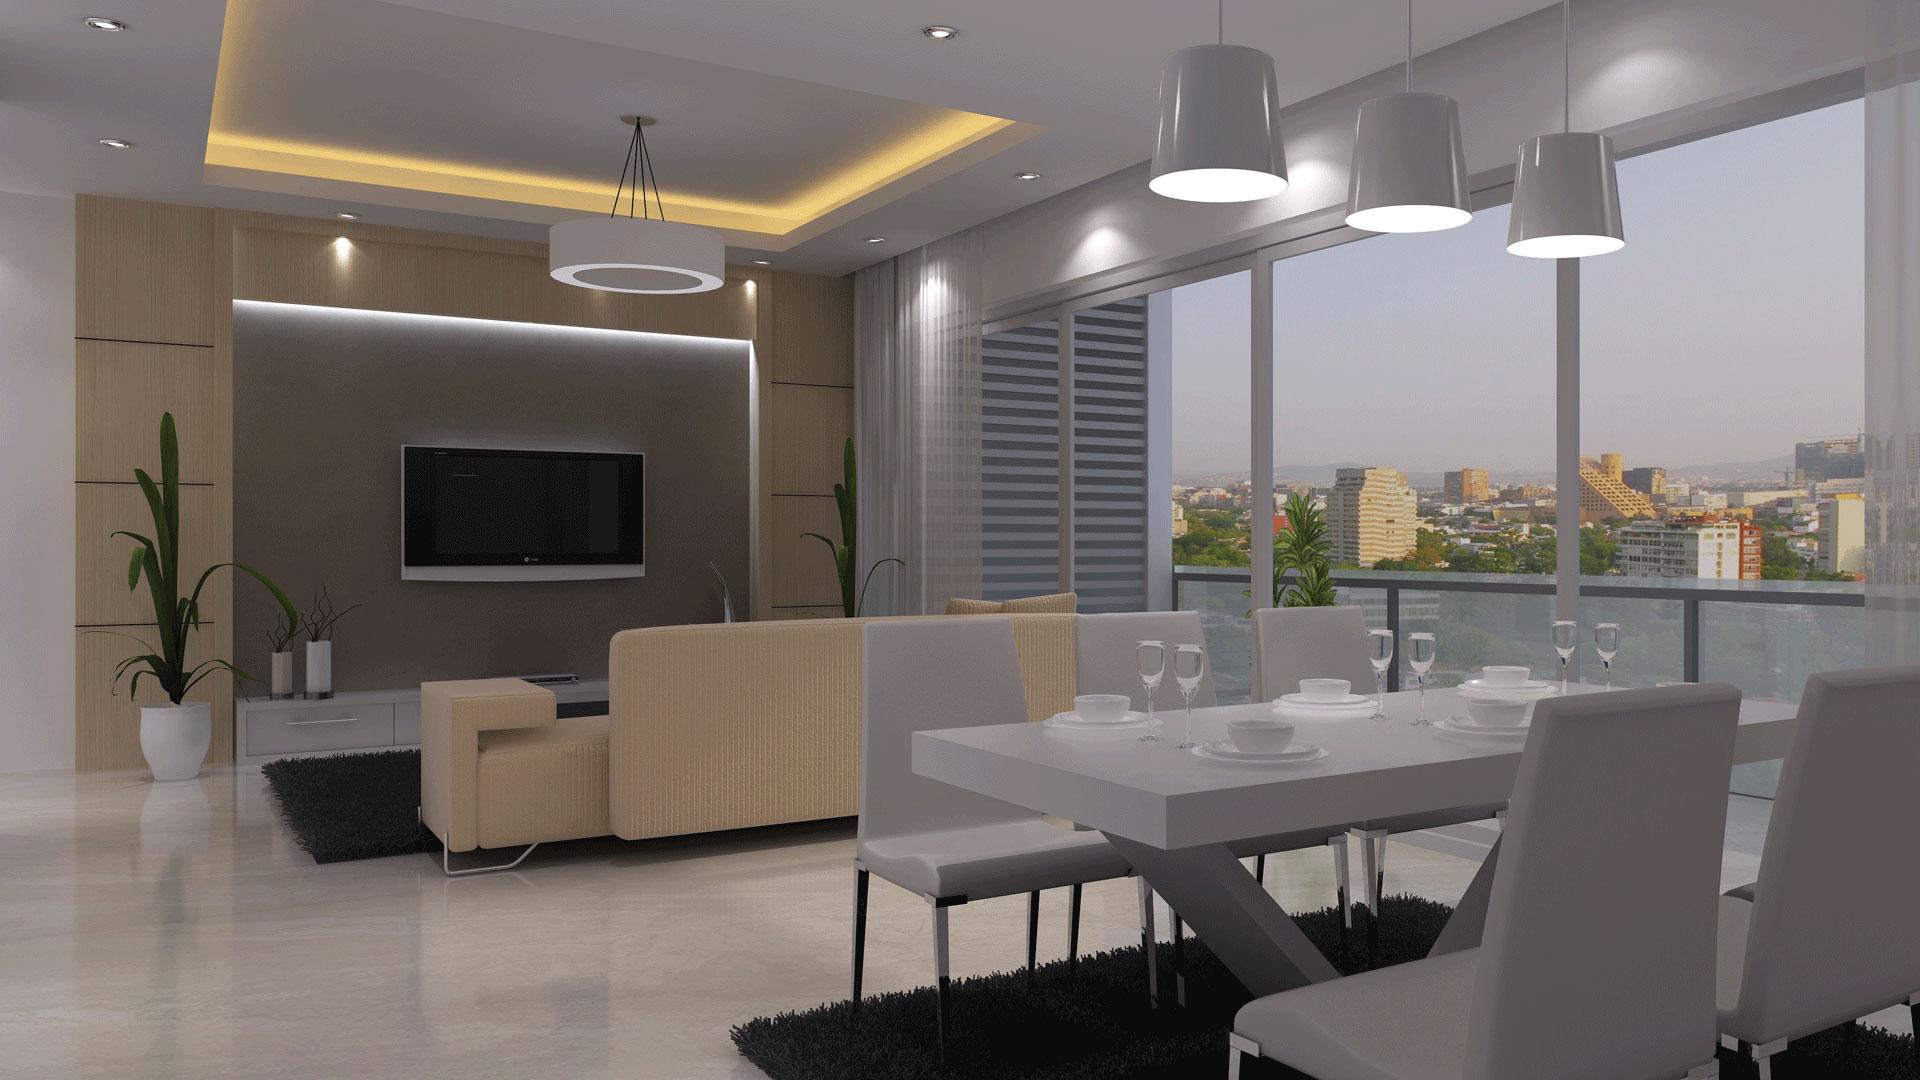 prestige-deja-vu-Apartment-in-pulkeshi-Nagar-Bangalore-Image-05